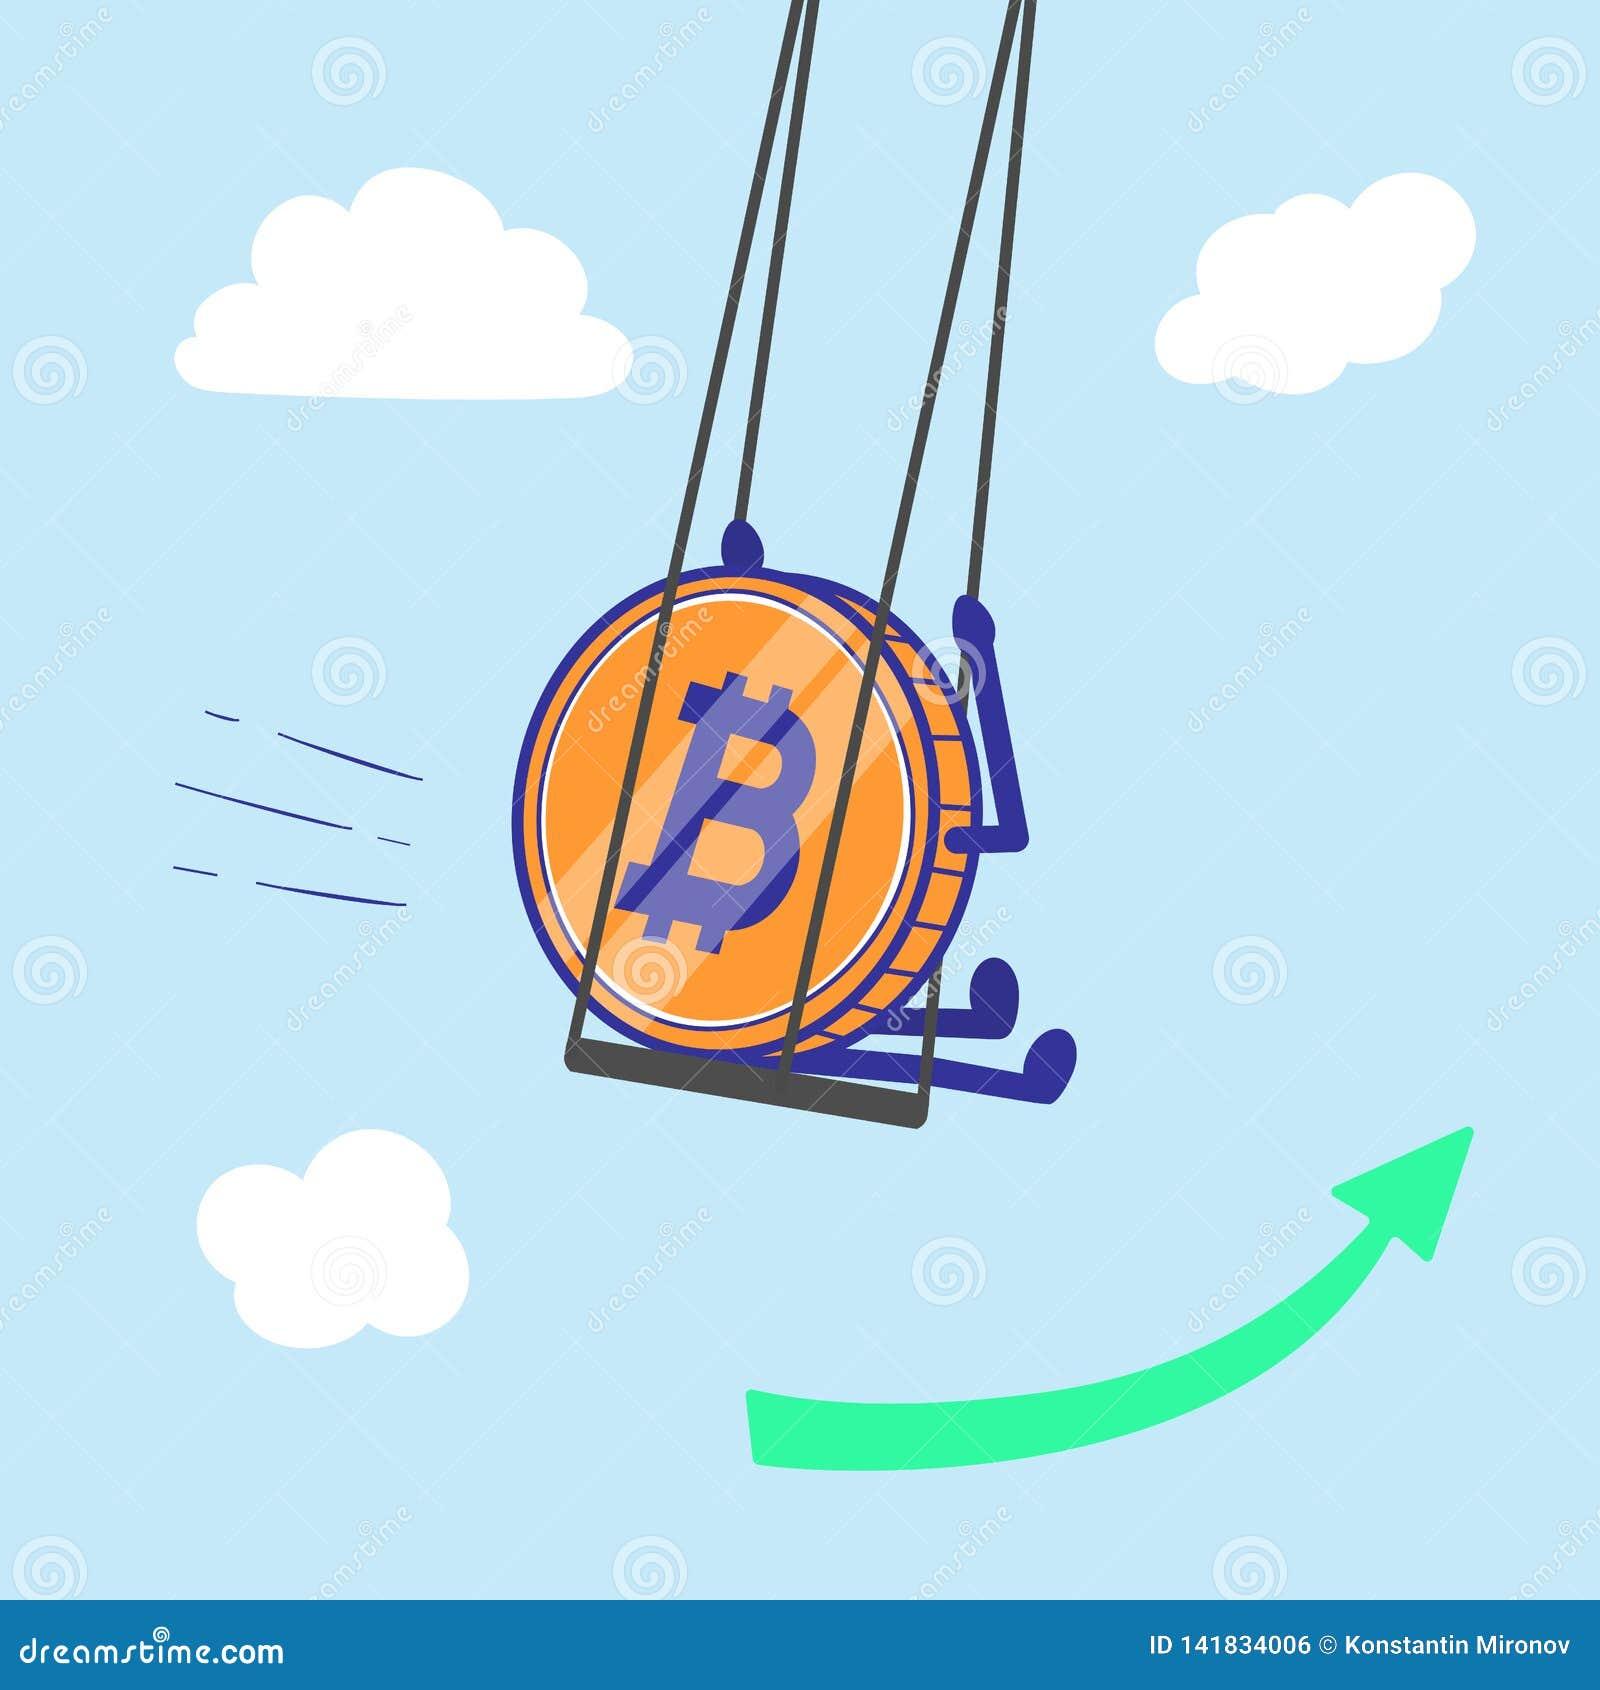 swing btc